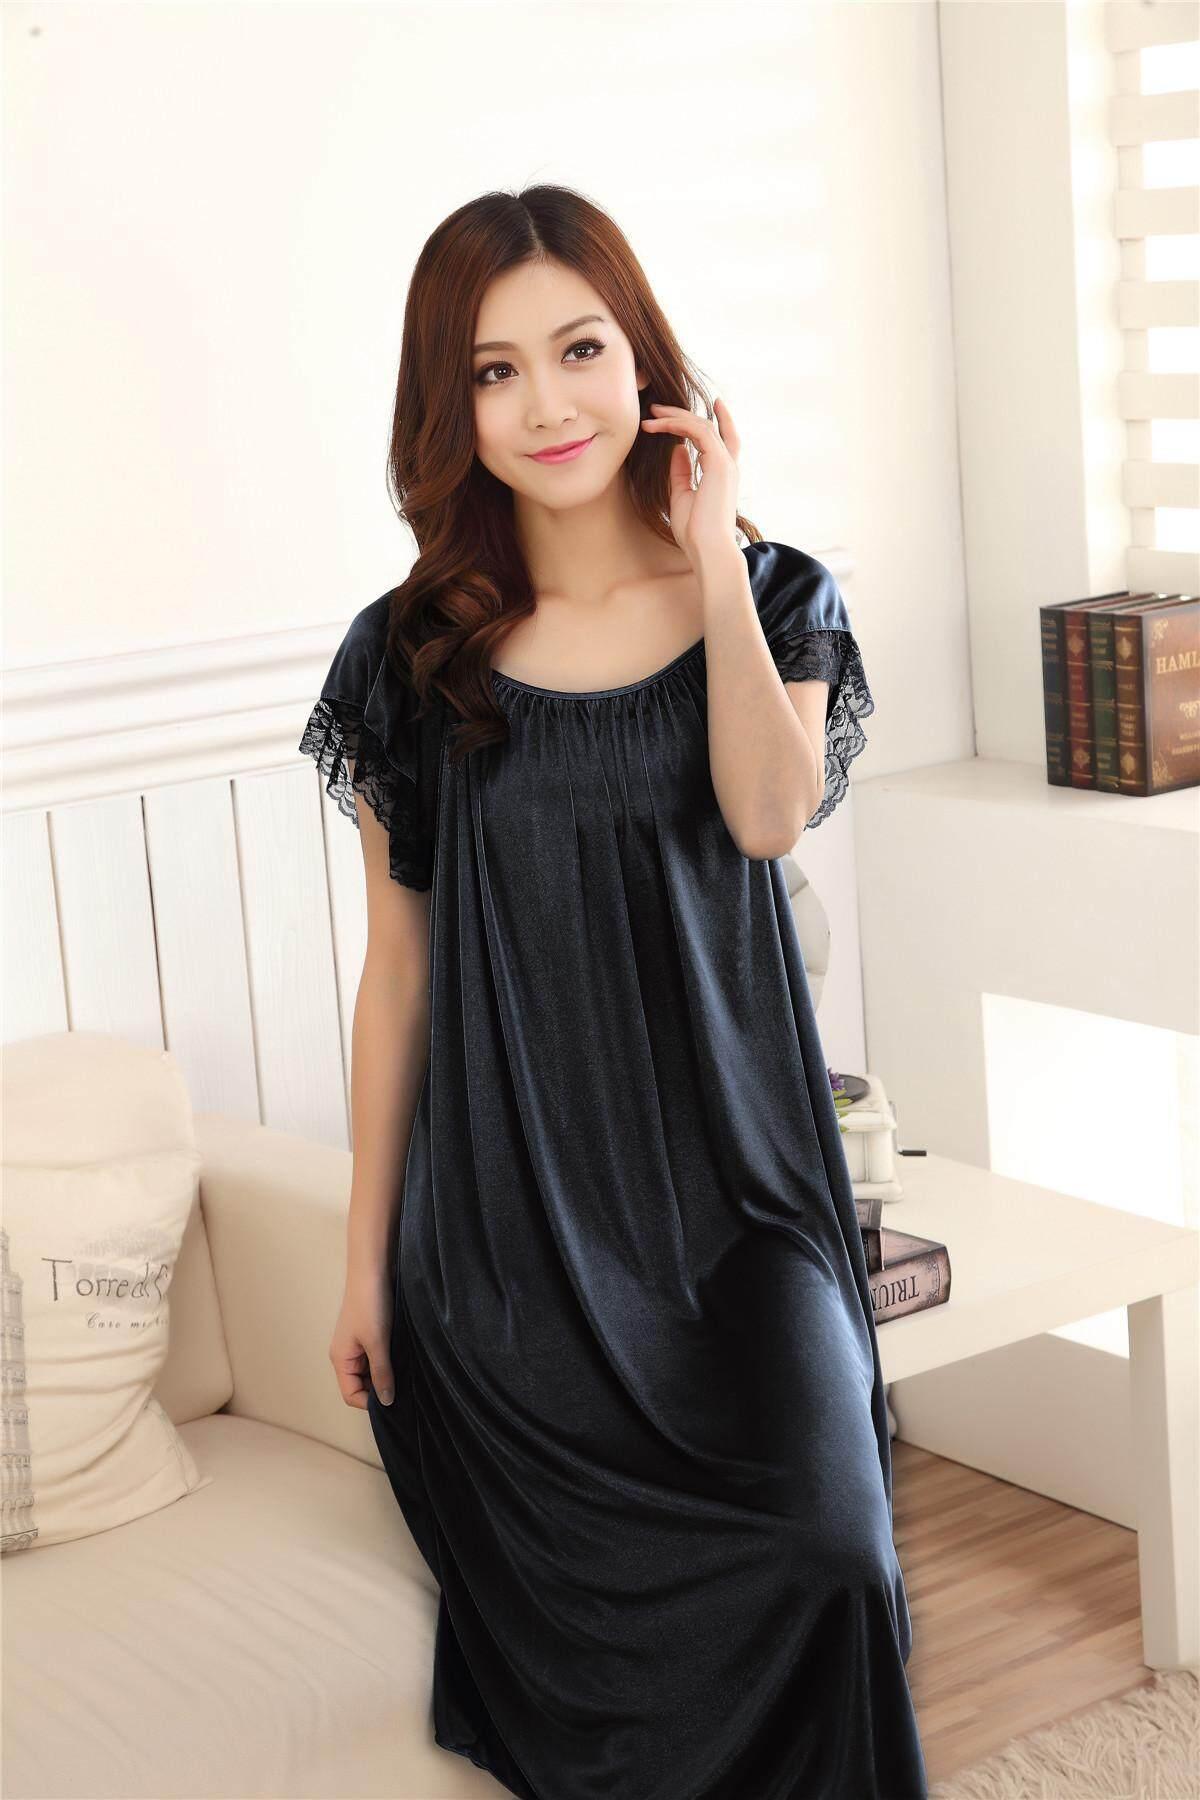 Bolster Store Ladies Women Sleepwear Sexy Lingerie Basic Plain Design Pajamas Long Skirt Silk Comfortable Wear #402